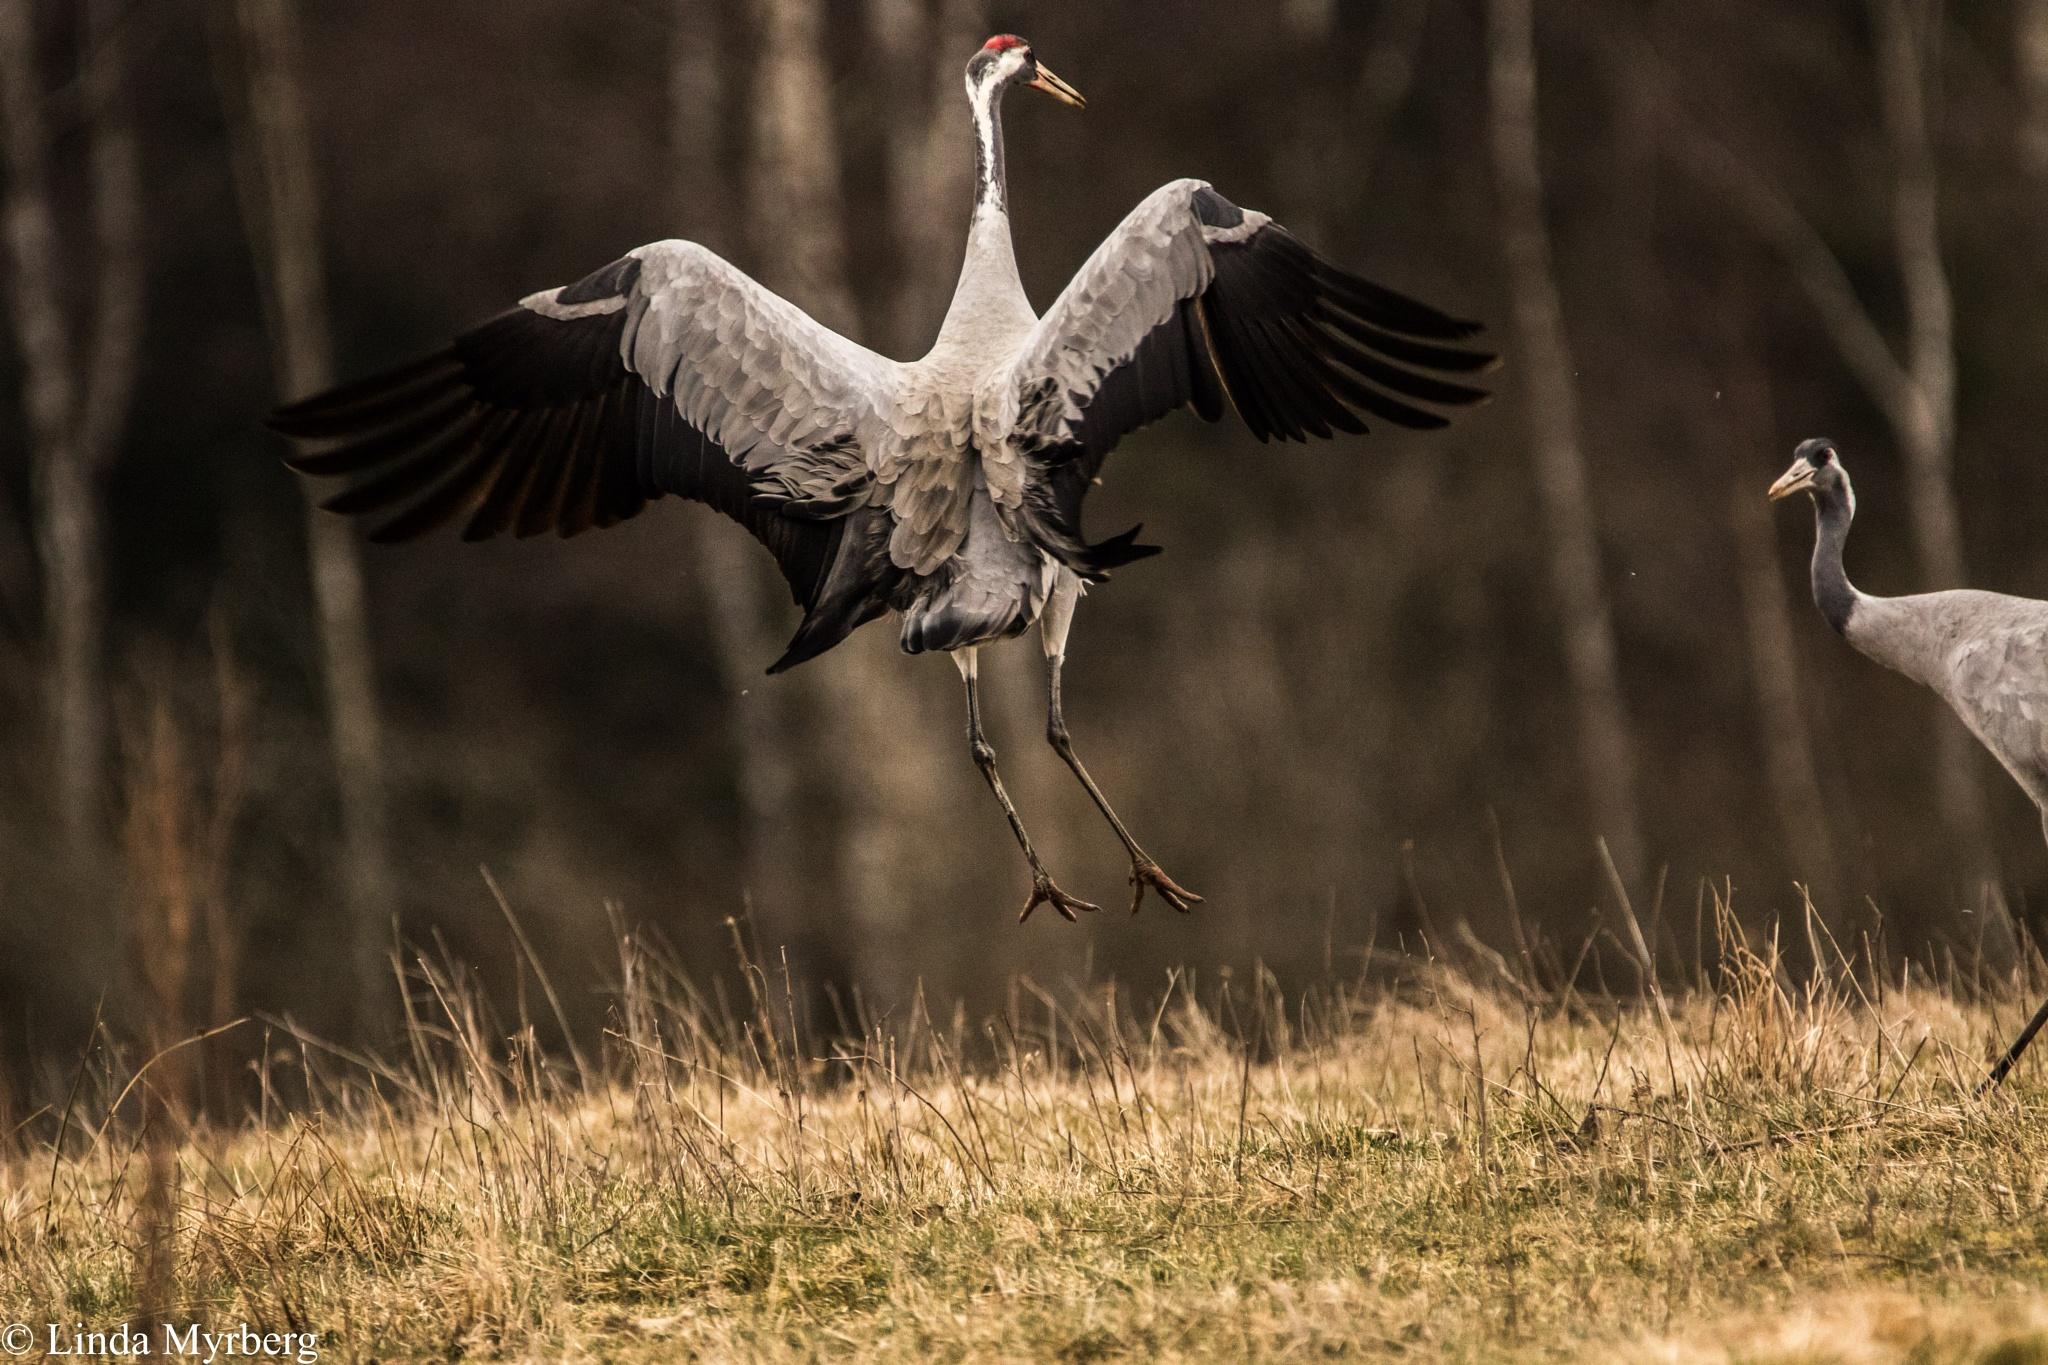 Dancing Crane by Linda Myrberg